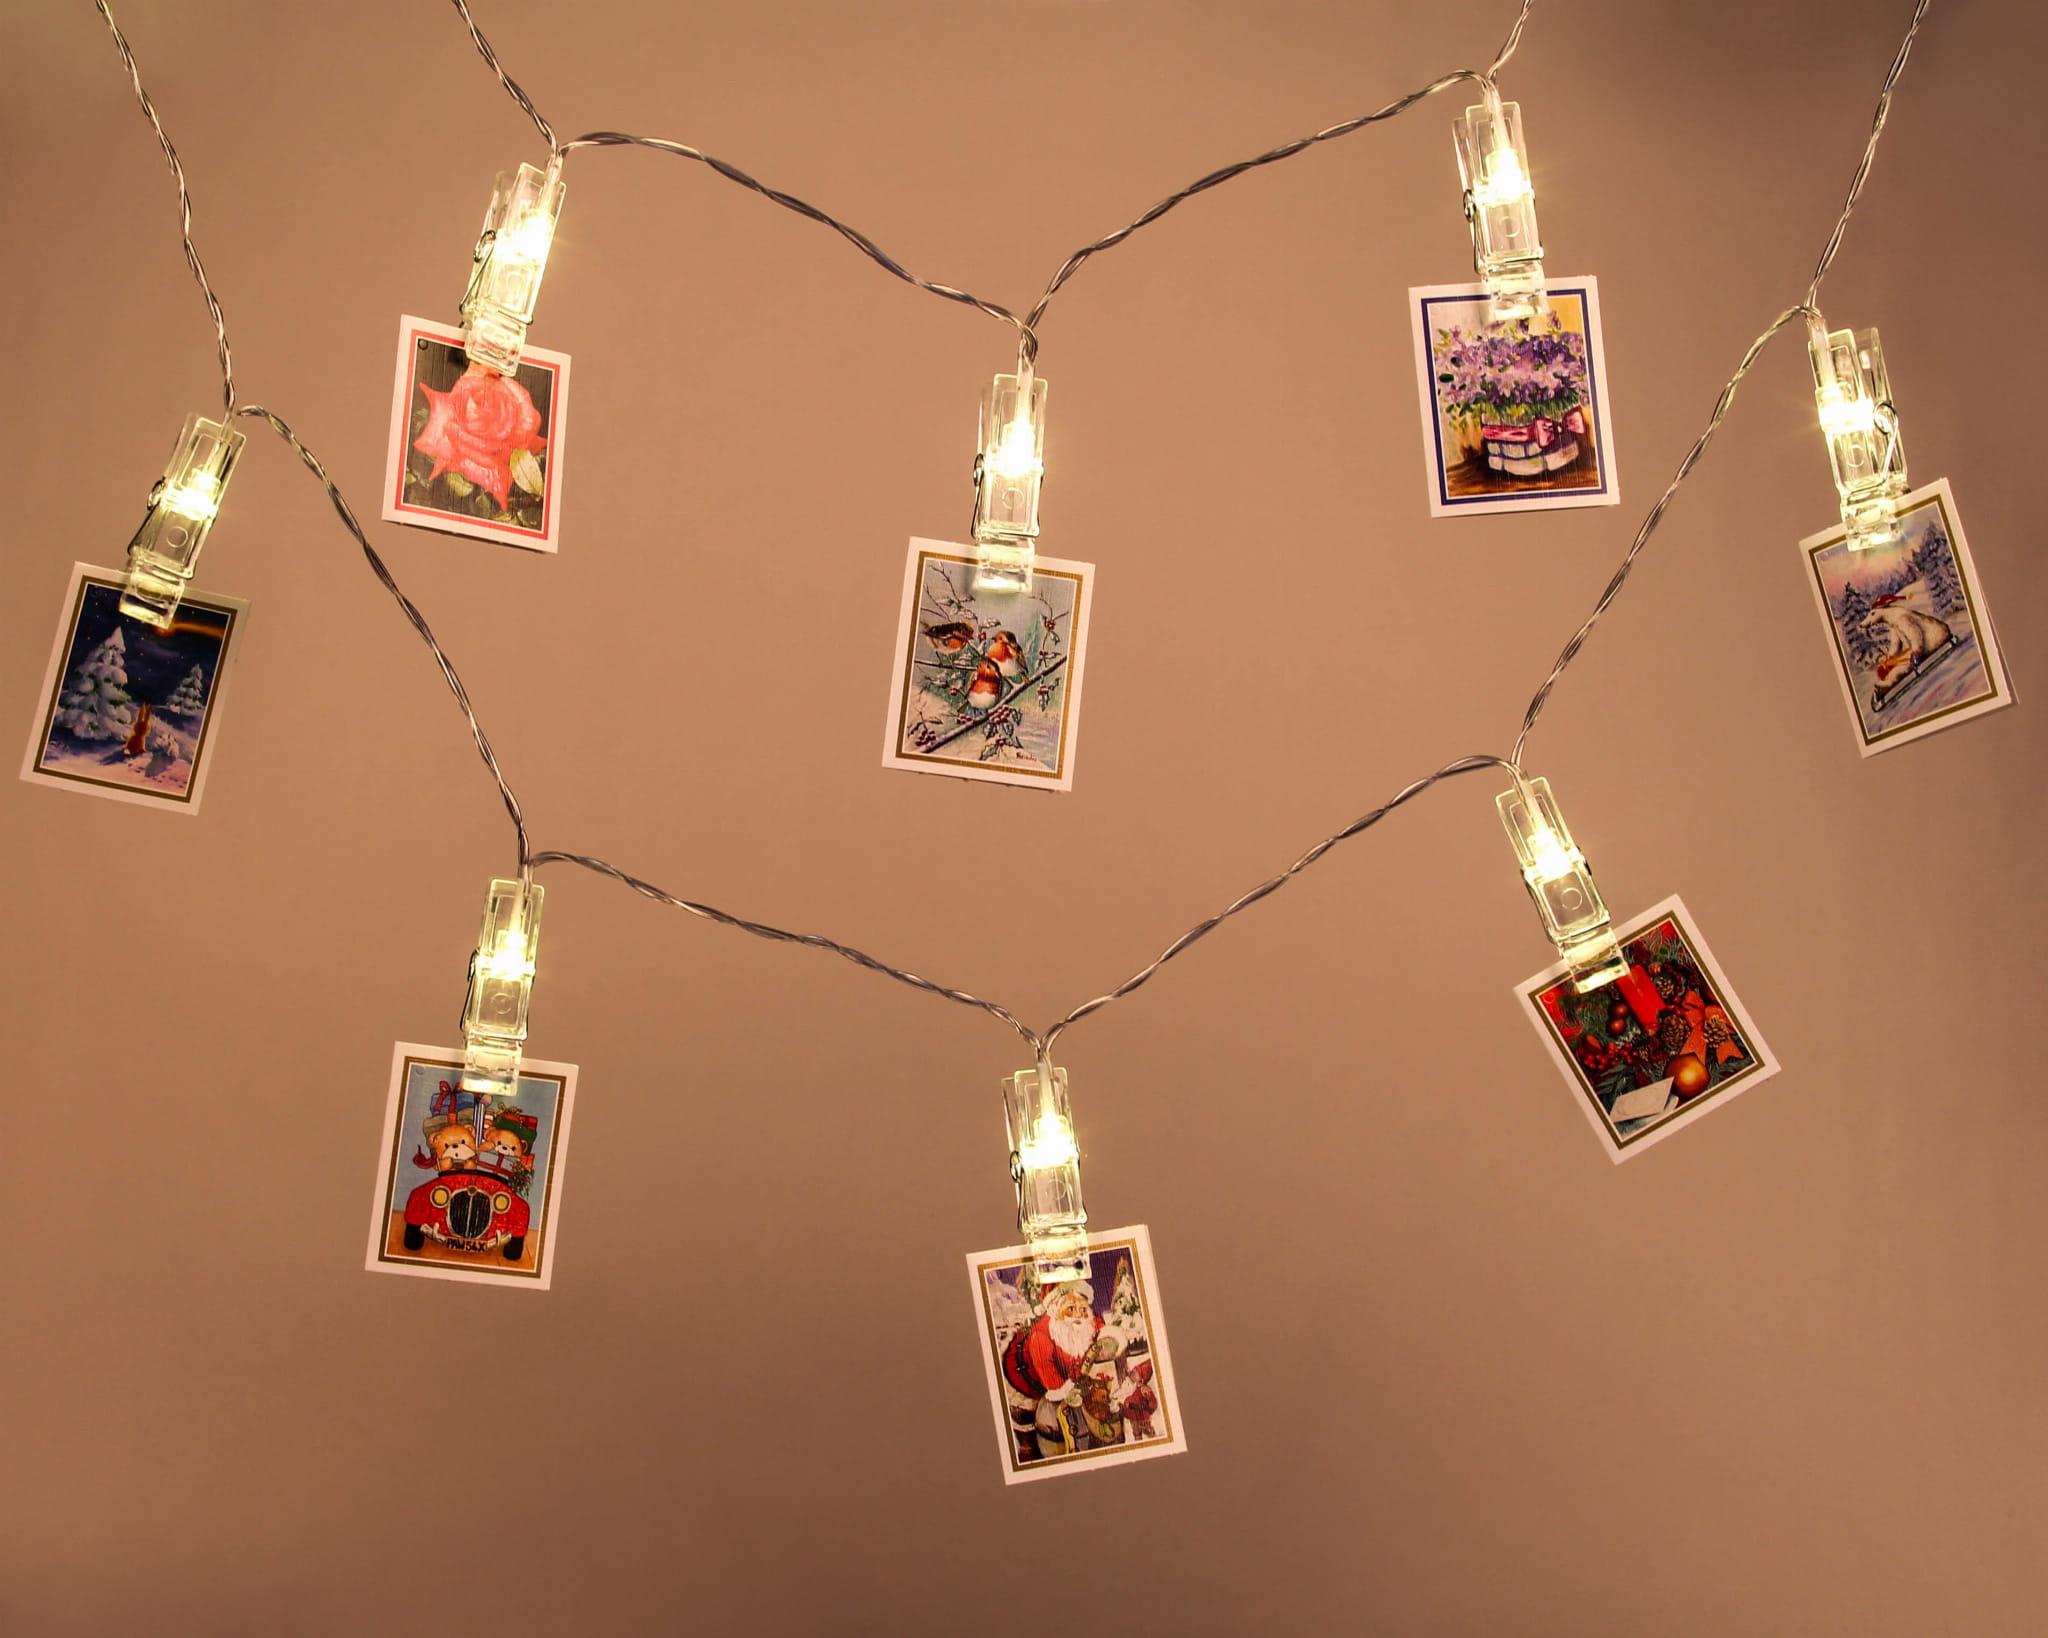 Lampki Dekoracyjne Klamerki 40 Led Z Programatorem 8 Funkcji Joylight